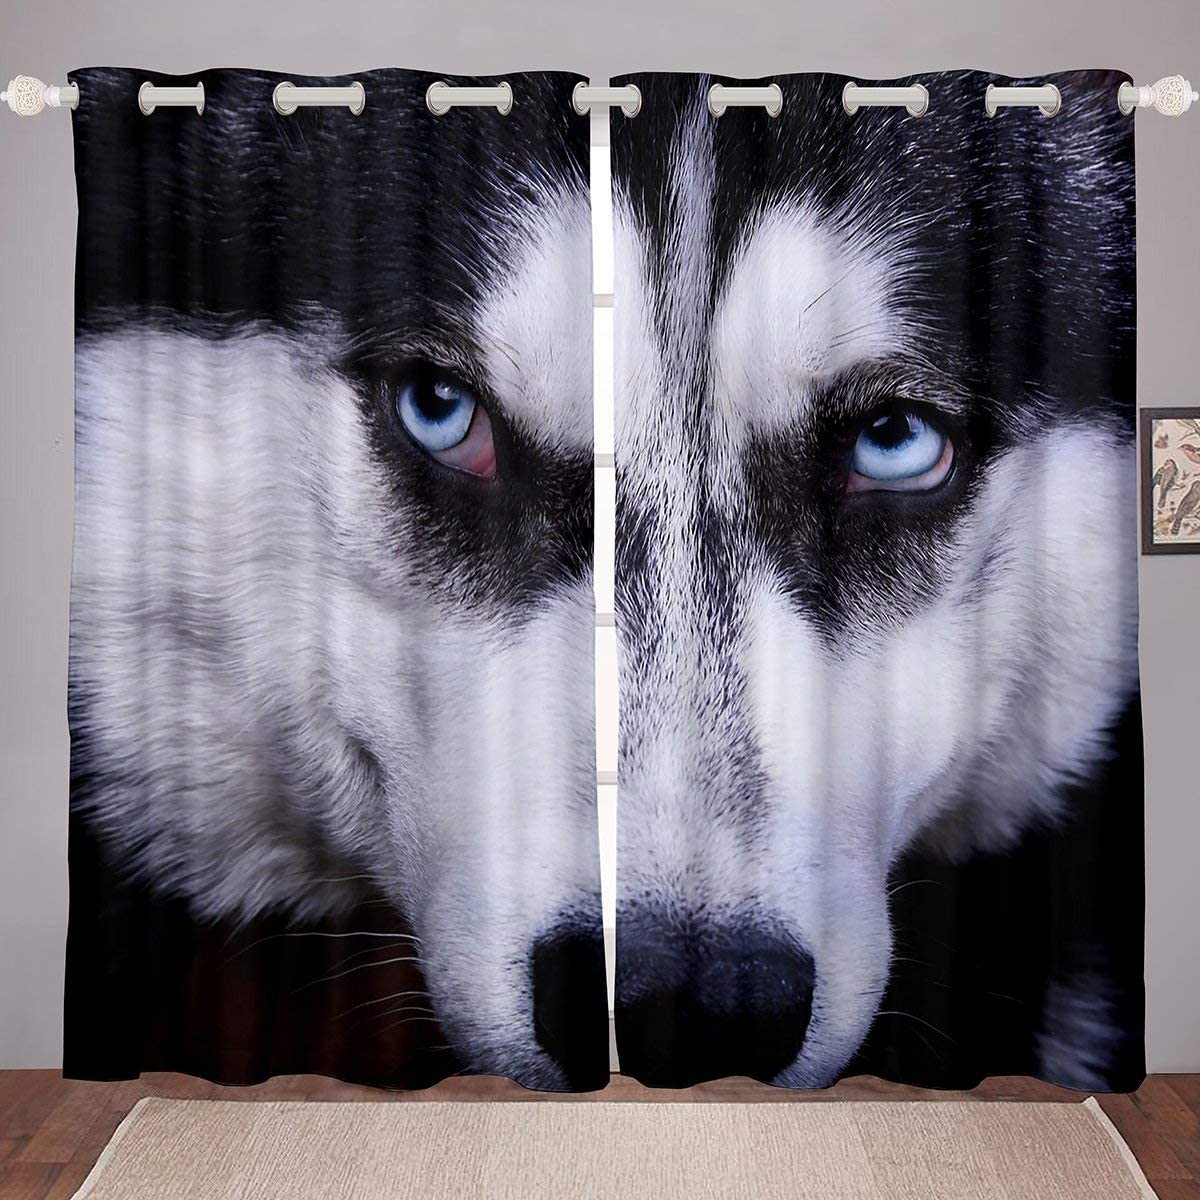 Erosebridal Husky Window Treatments for Kids Teens Adults, Puppy Pet Animal Dog Silhouette Window Drapes, Boys Girls Room Decor Living Room Curtain Panels Shading, 104W96L, Black White